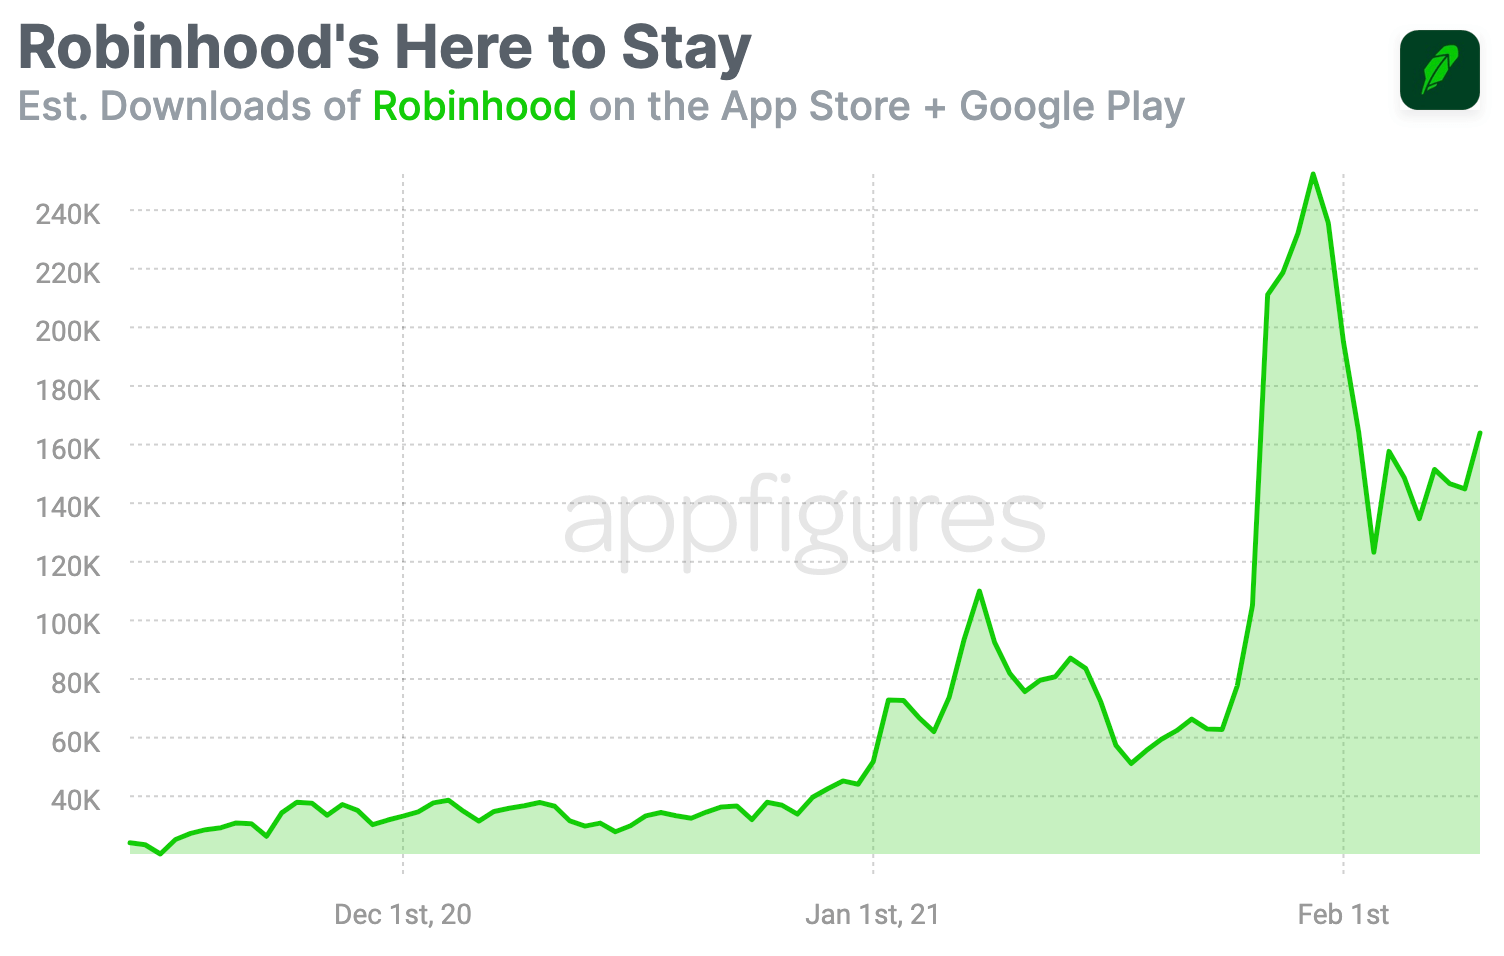 Estimated downloads of Robinhood based on Appfigures app intelligence